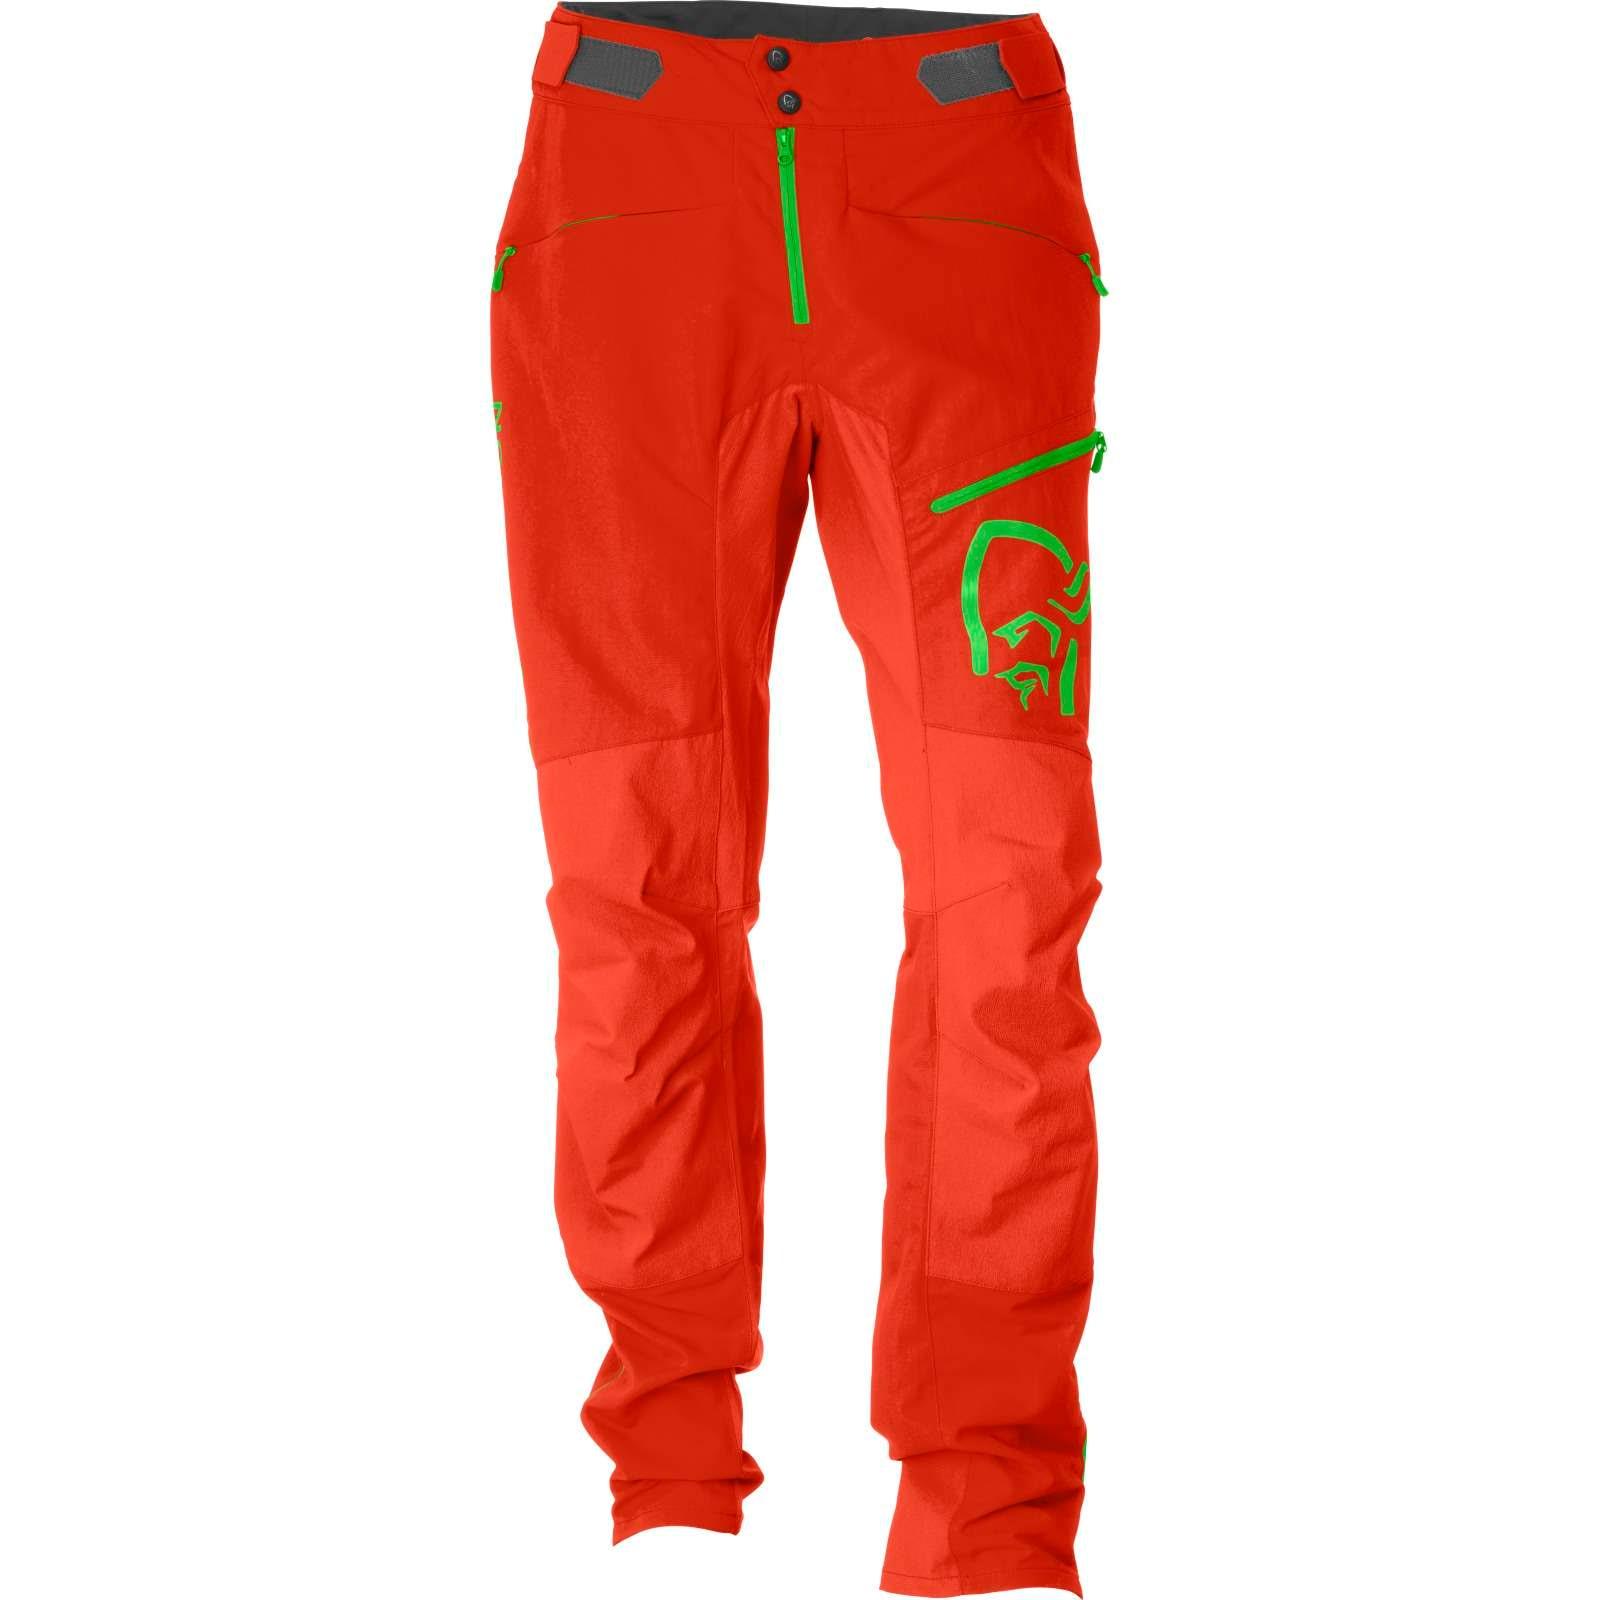 b5e231be Kjøp Norrøna Fjørå Flex1 Pants (m) fra Outnorth